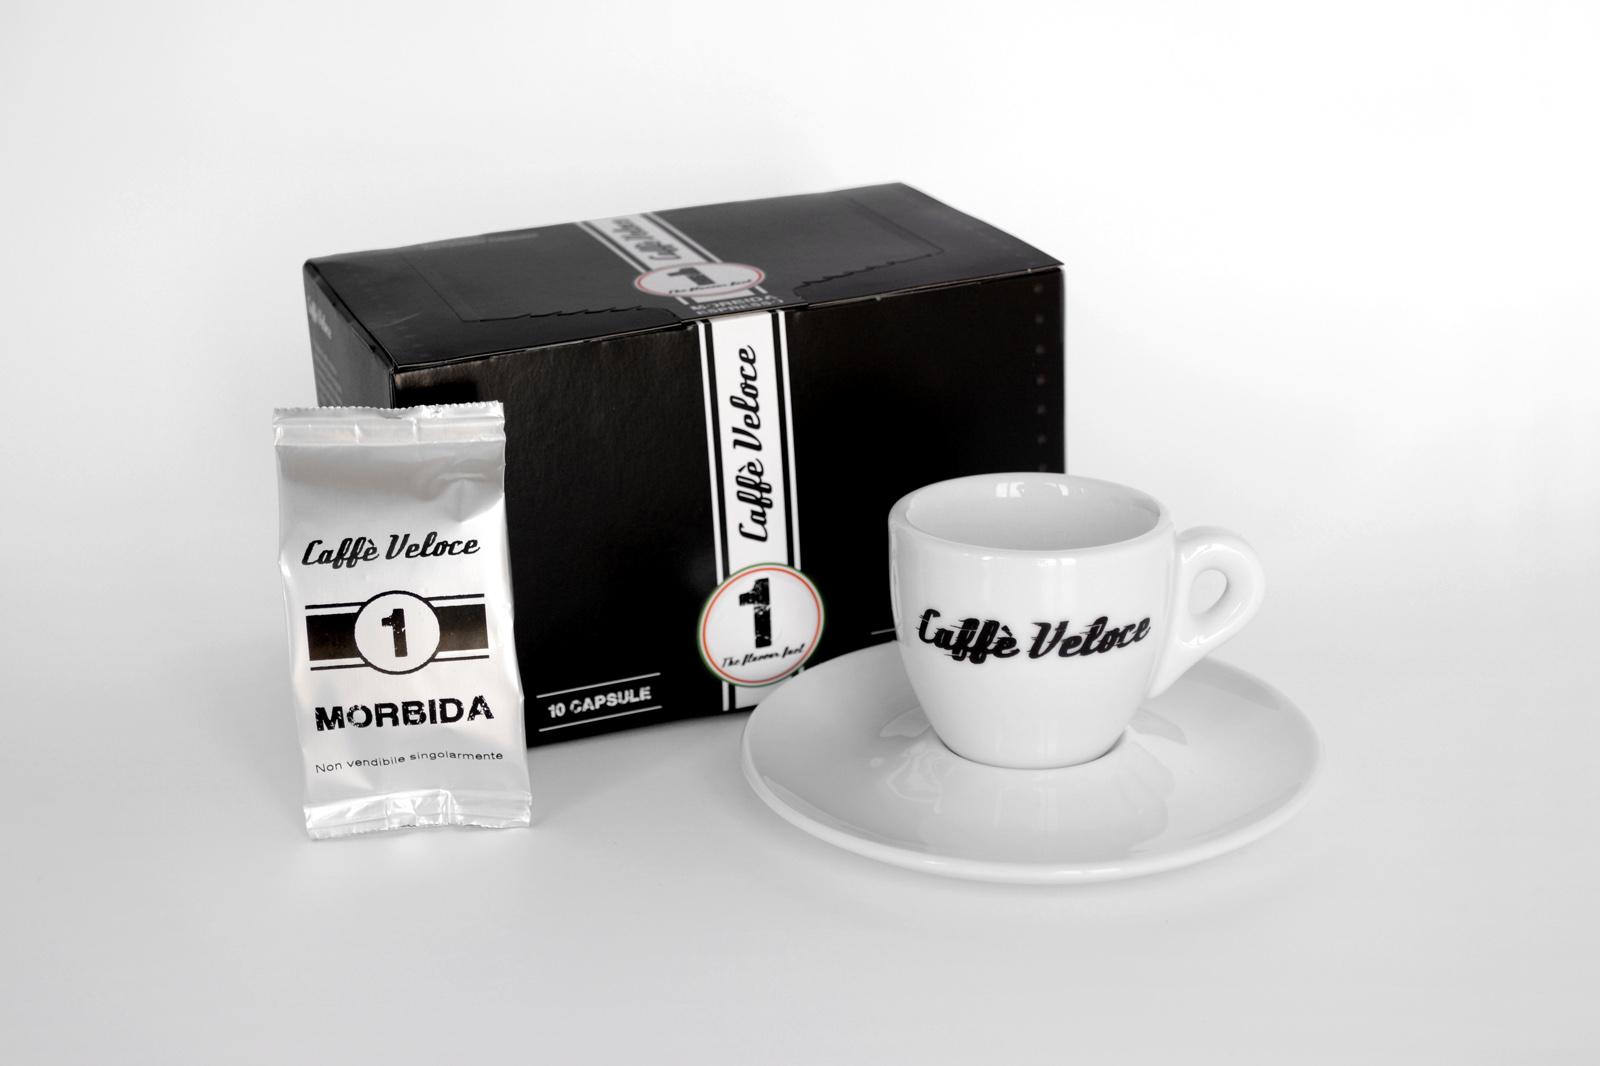 Espresso Cup - Morbida